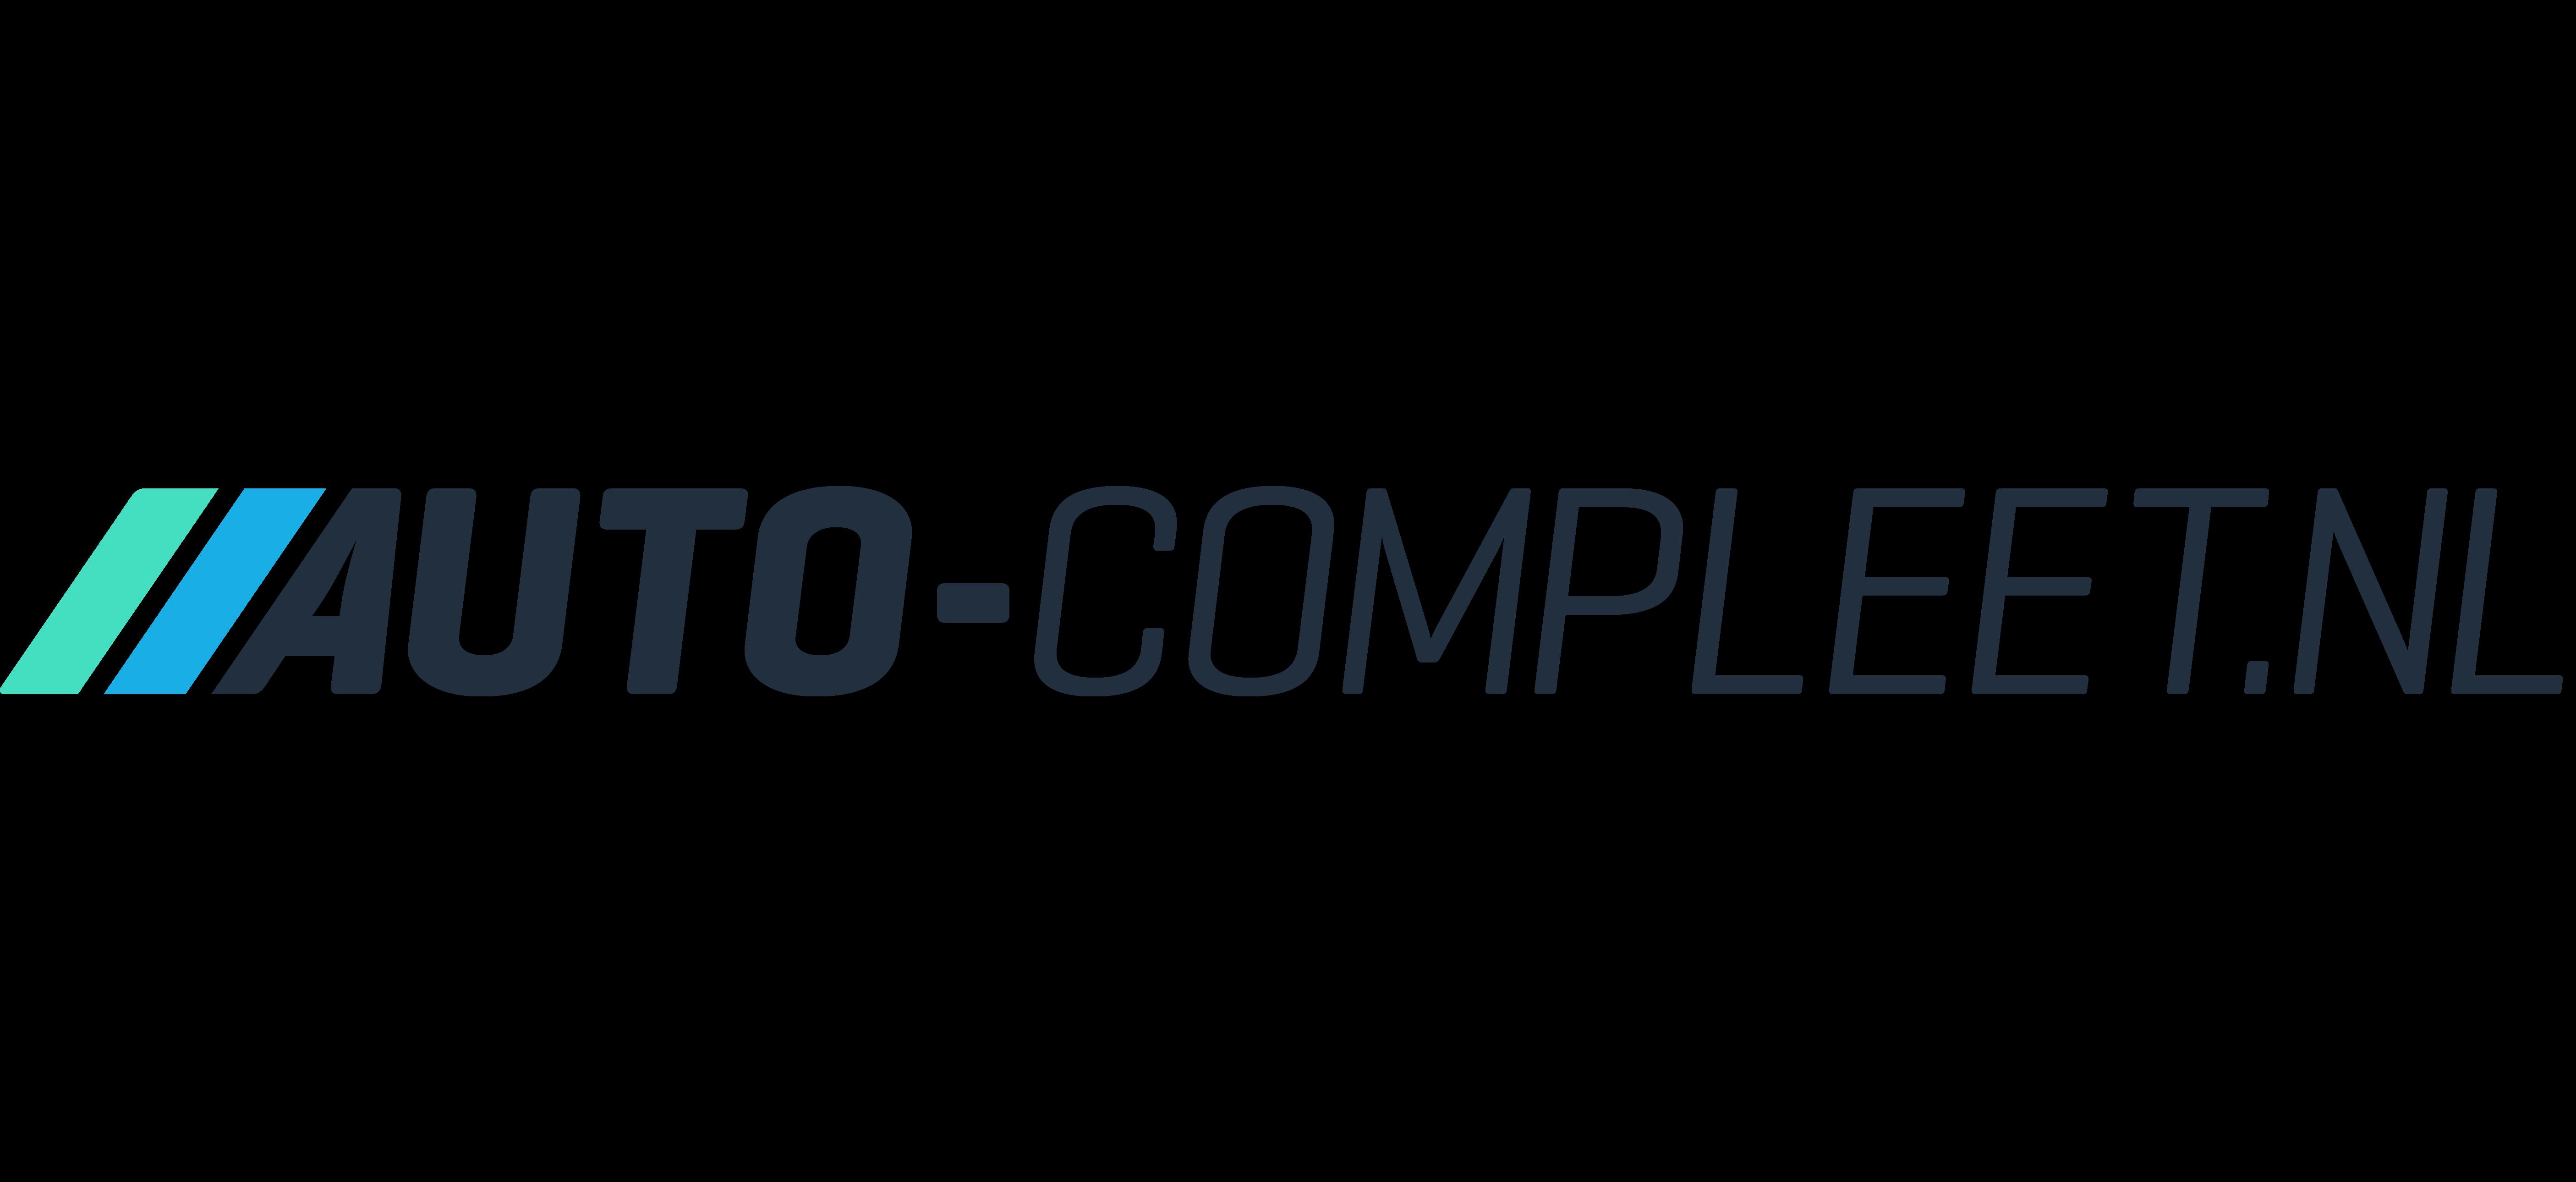 Auto-compleet.nl